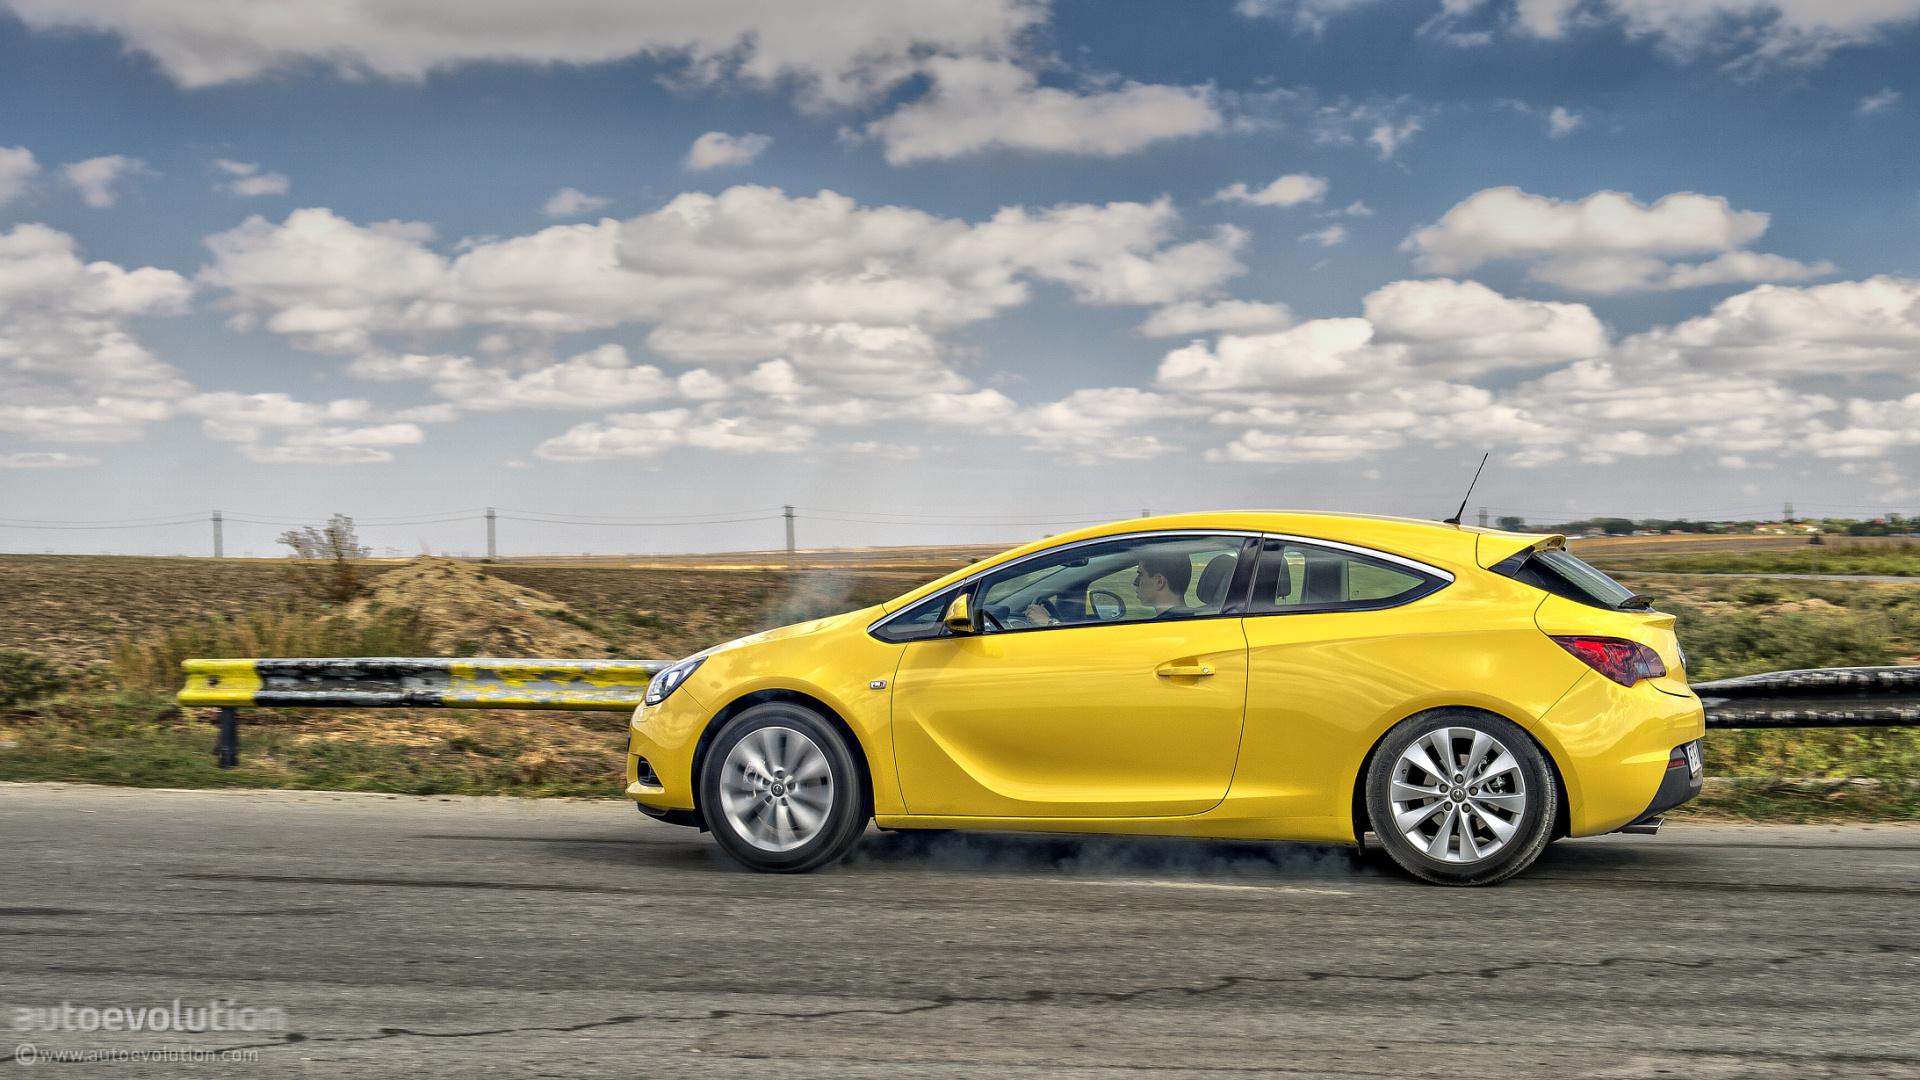 Opel Astra хетчбэк песок горы дорога онлайн